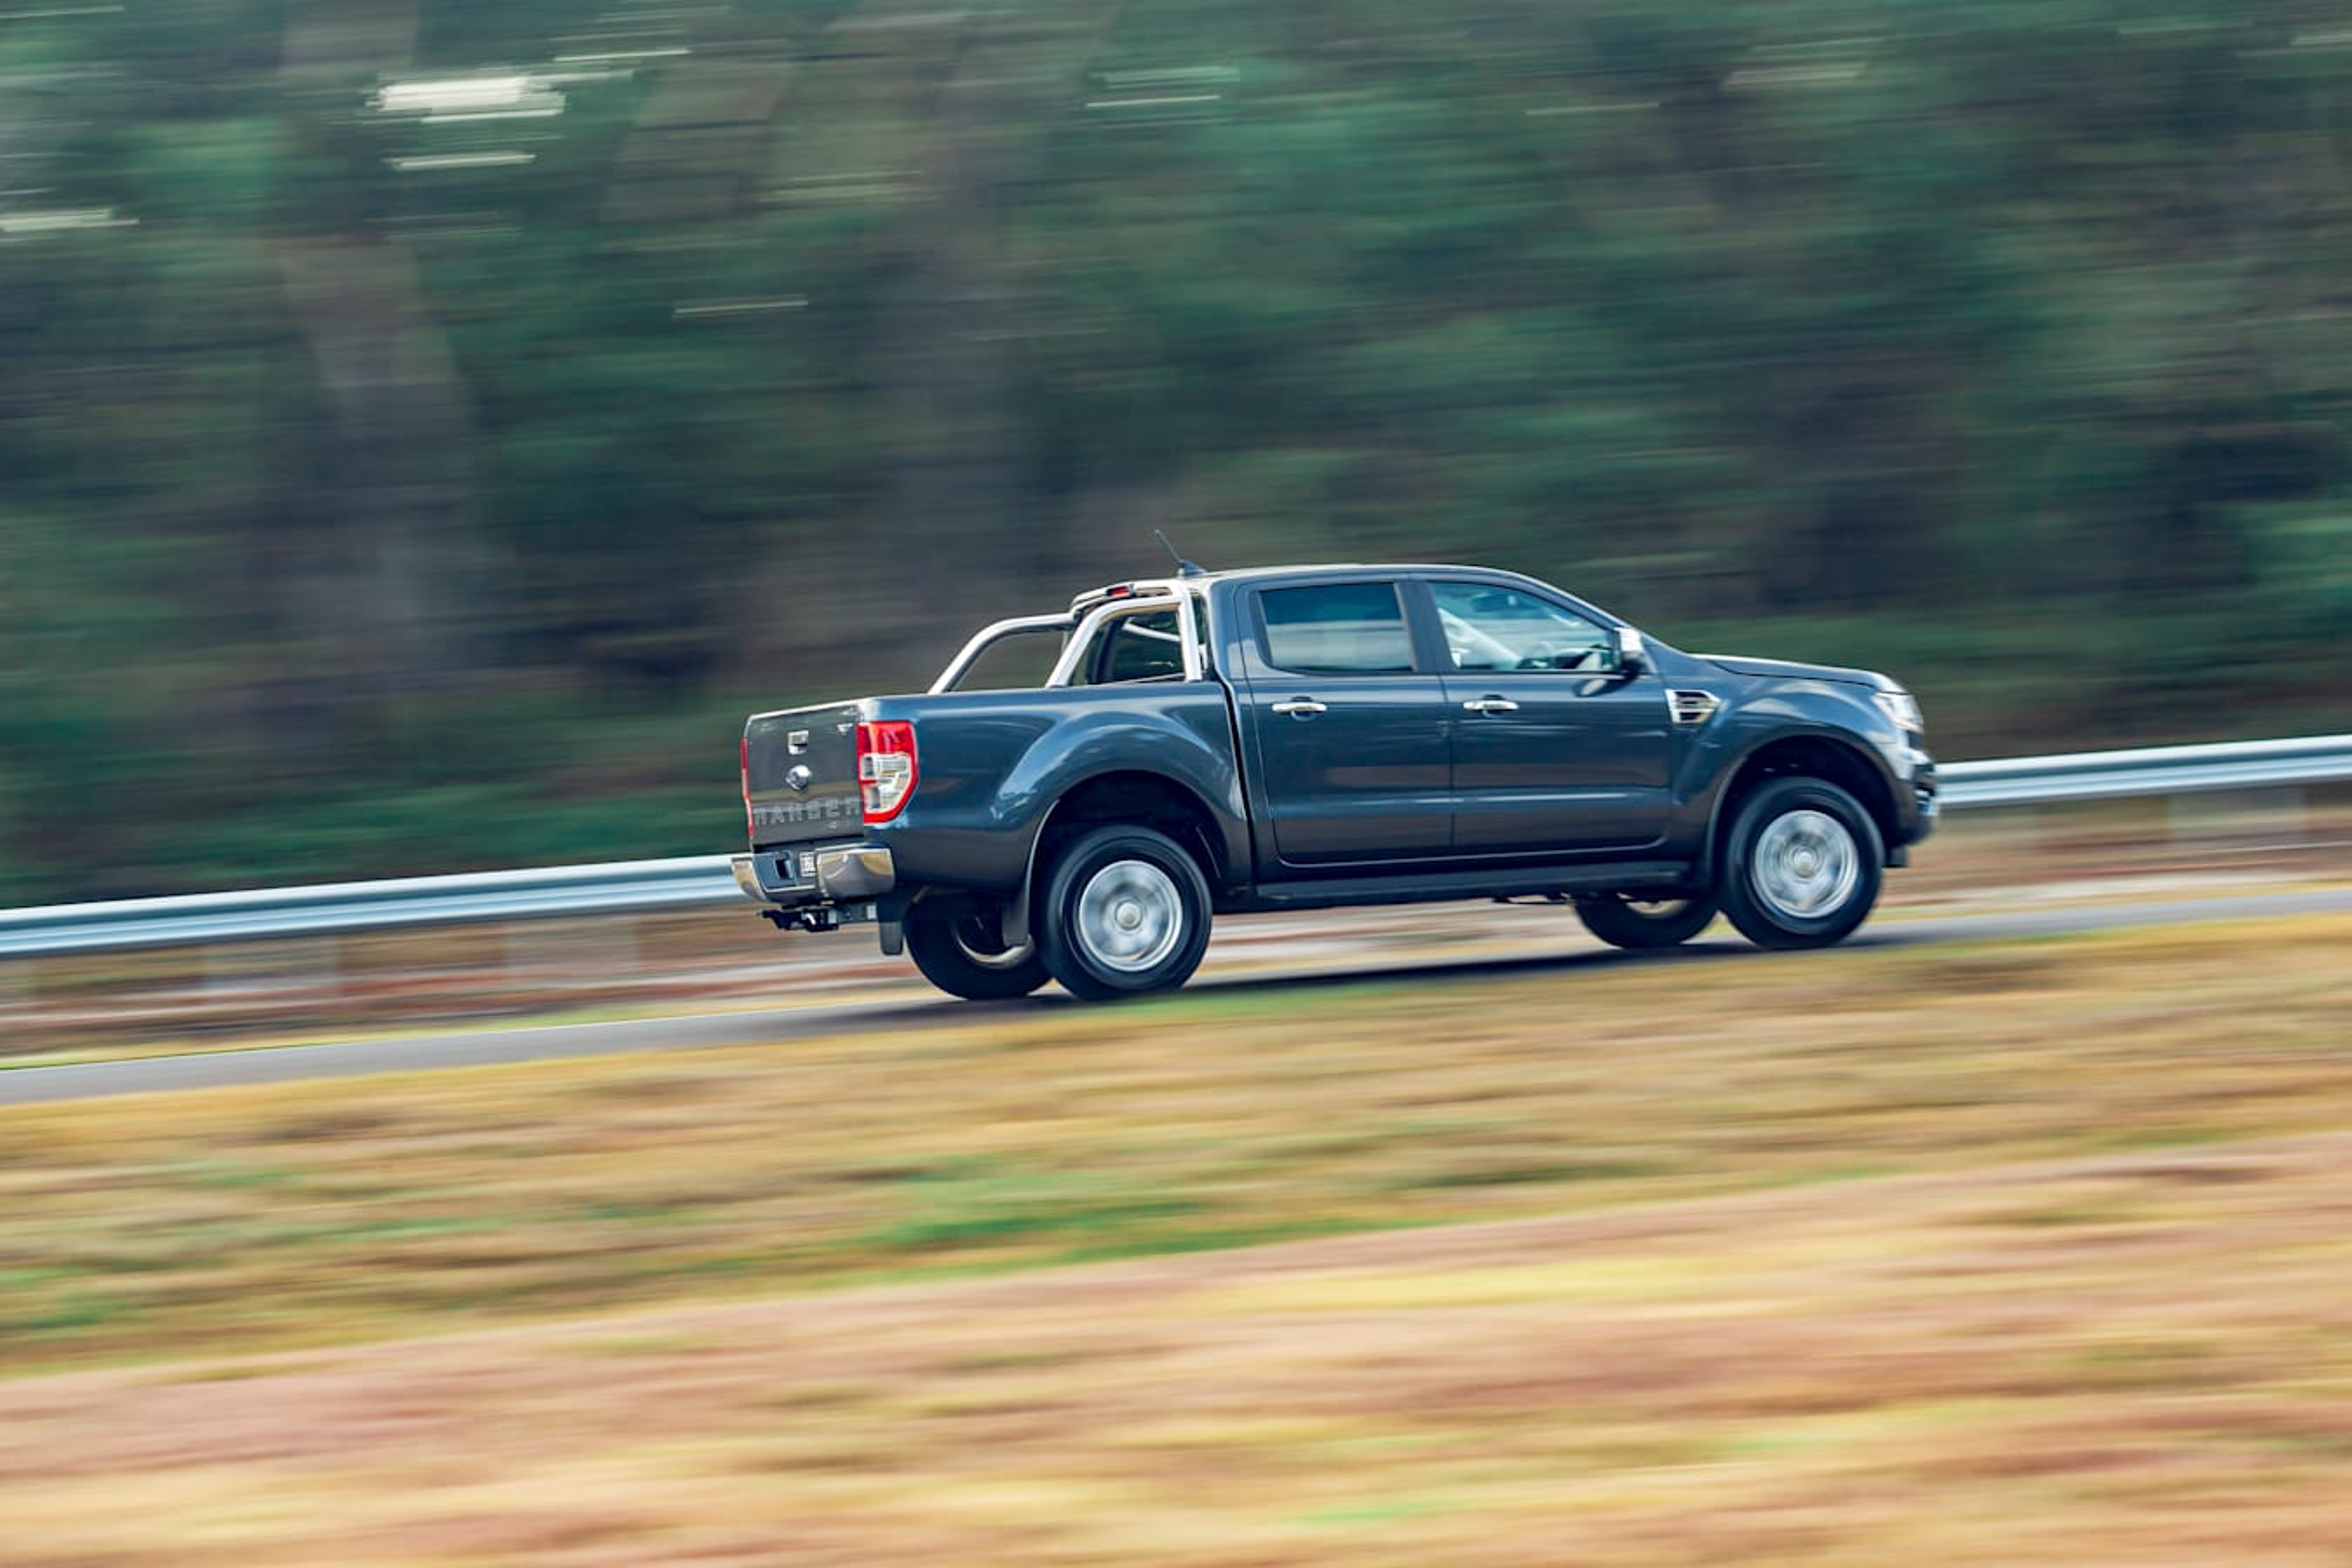 4 X 4 Australia Comparisons 2021 May 21 Ford Ranger XLT Performance